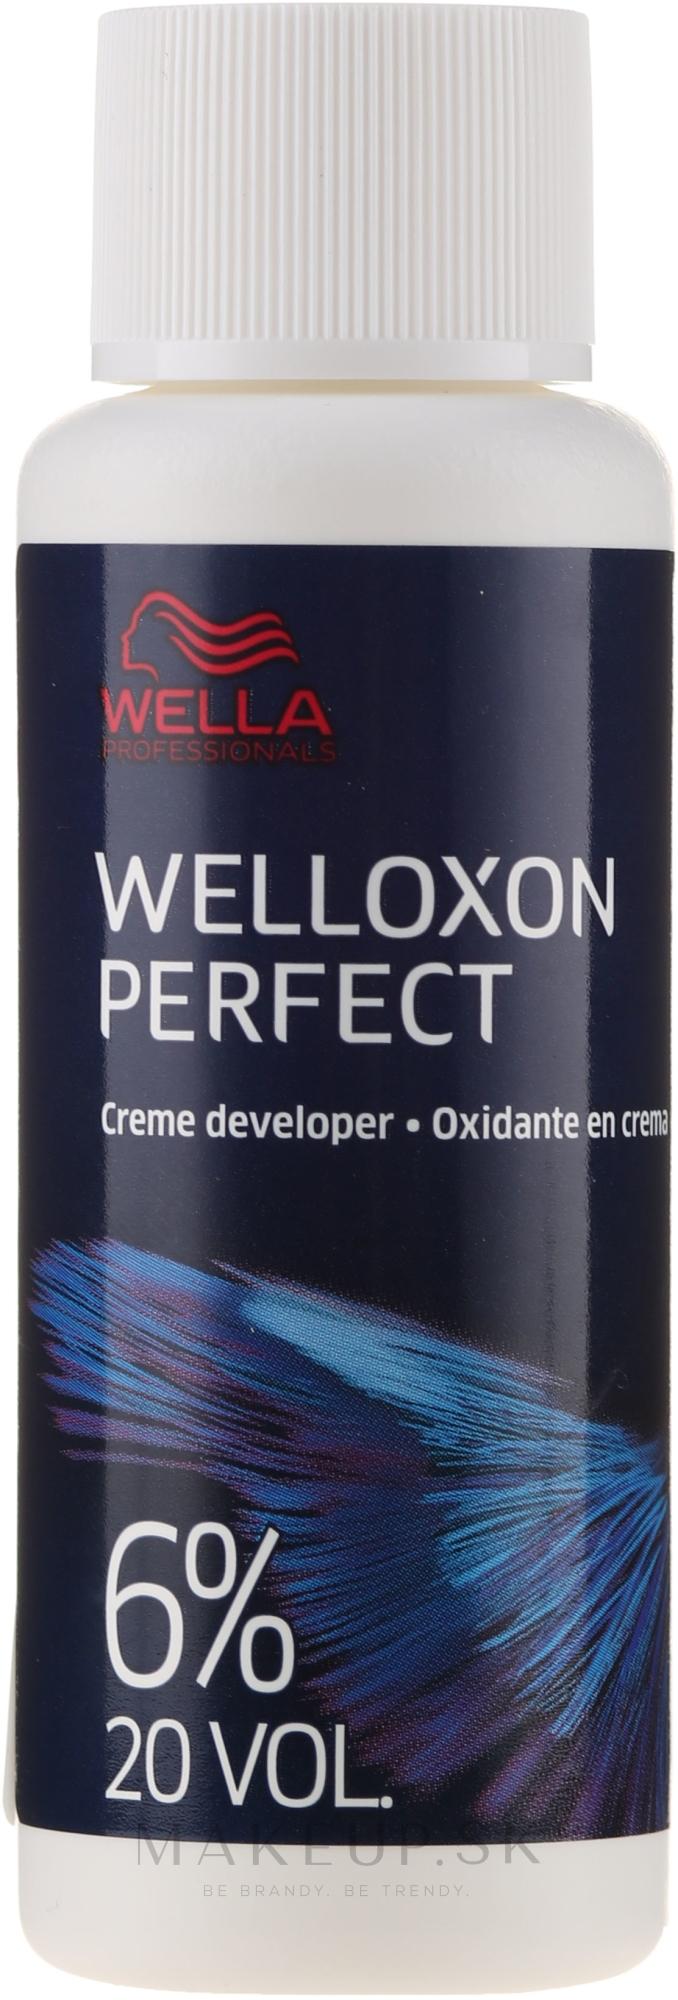 Oxidant - Wella Professionals Welloxon Perfect 6% — Obrázky 60 ml